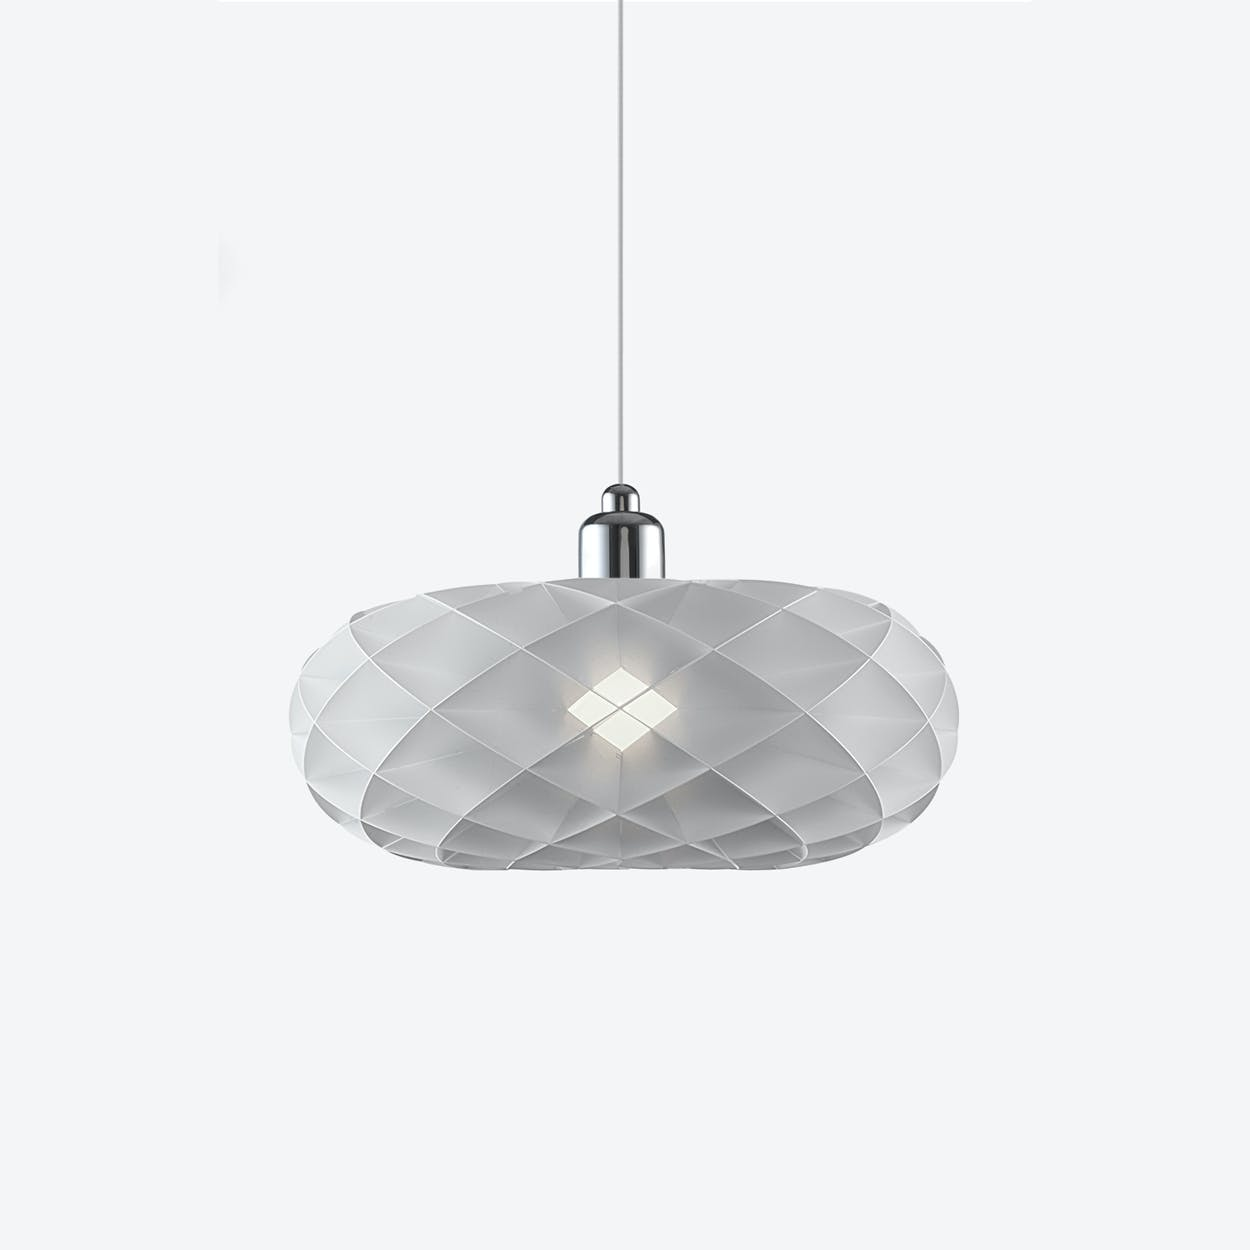 Torus Pendant Lamp with Chrome Top